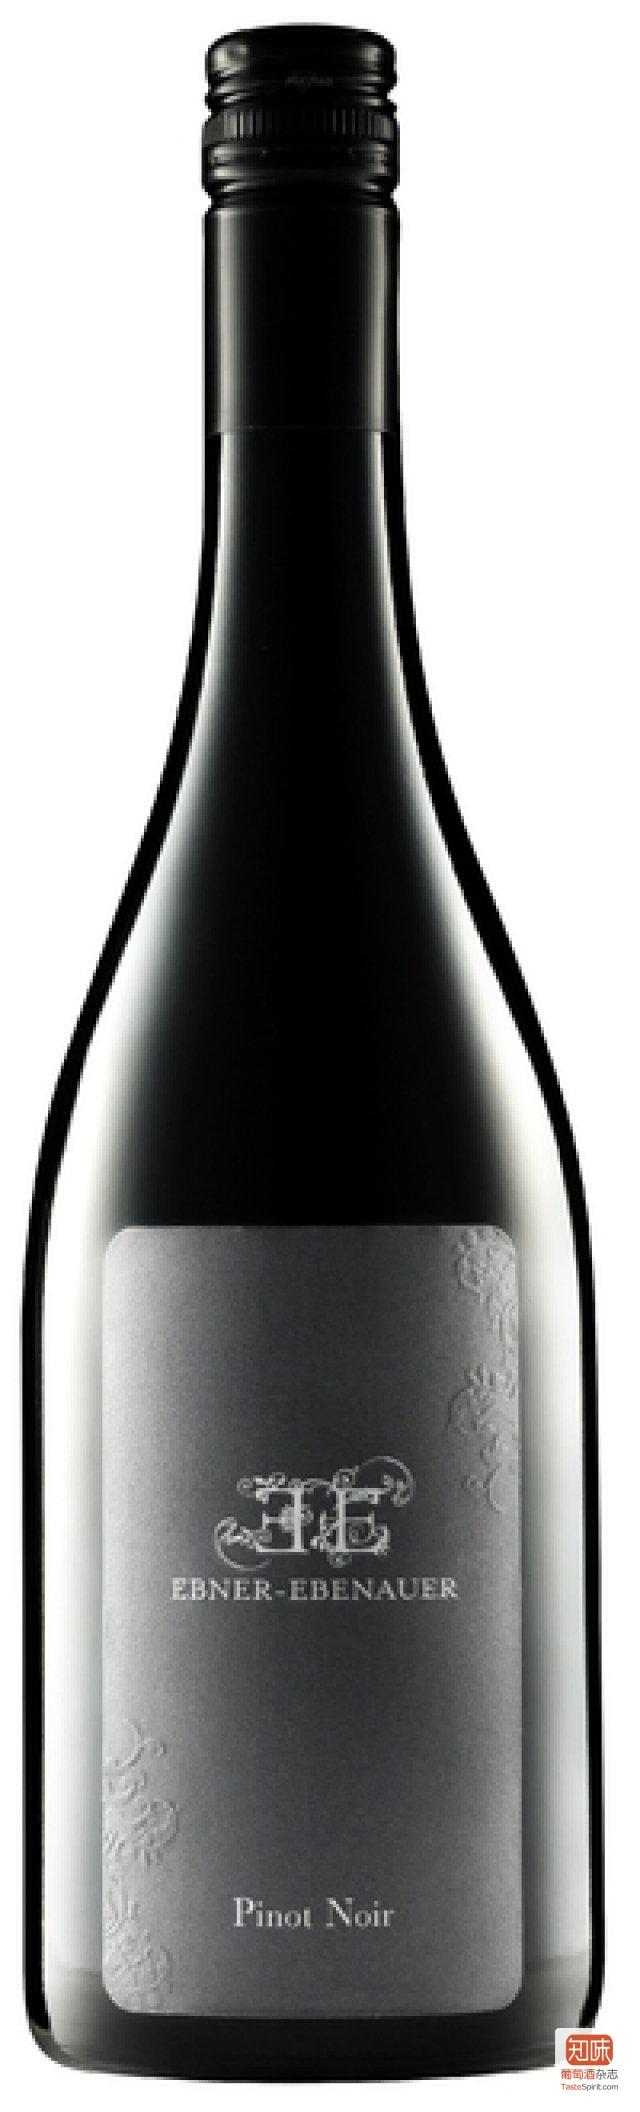 Ebner-Ebenauer Black Edition Pinot Noir